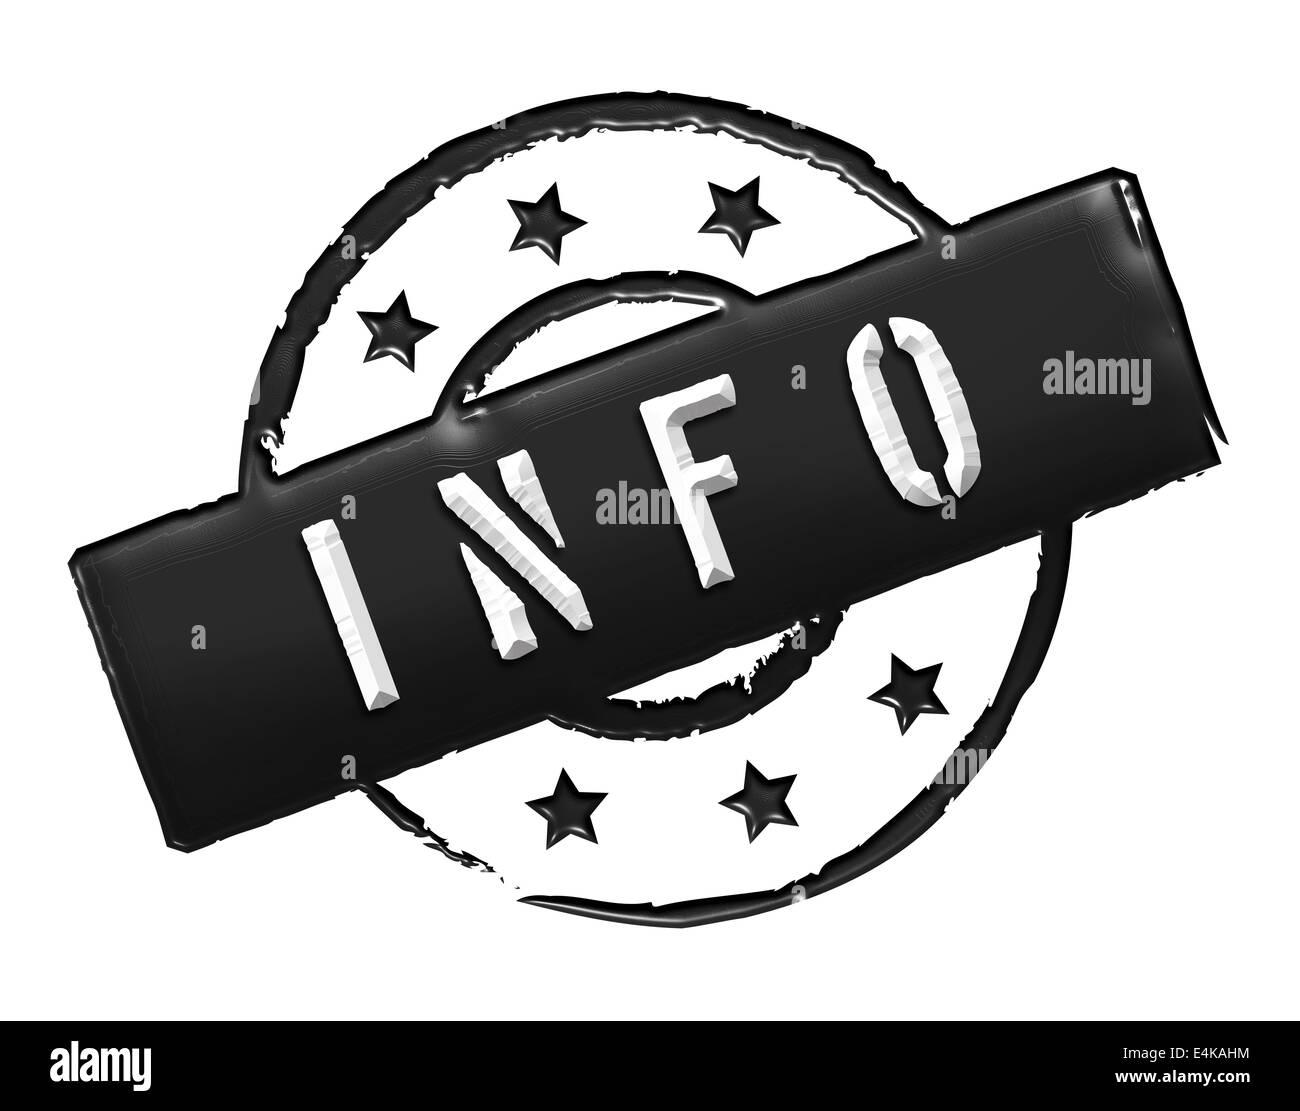 Stamp - INFO Stock Photo